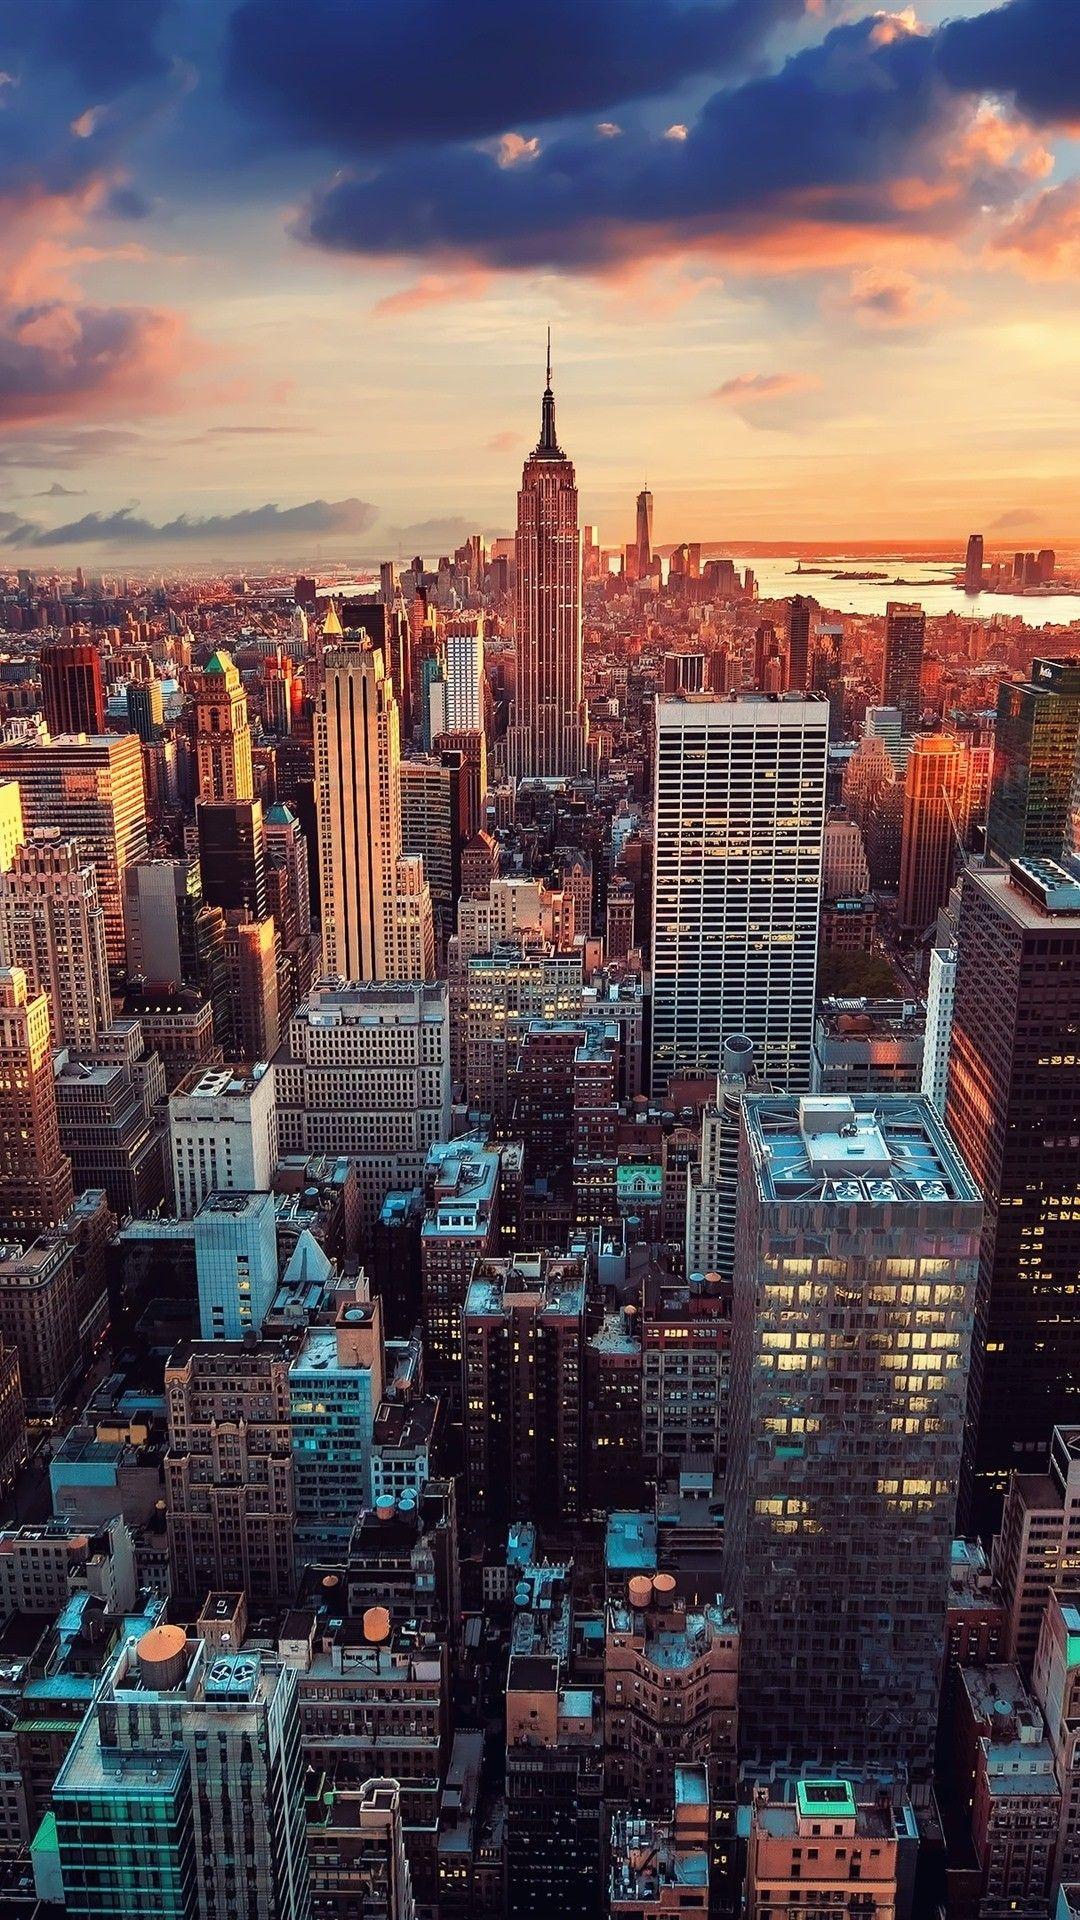 Iphone Wallpaper New York 289 Nyc Background New York Wallpaper City Aesthetic